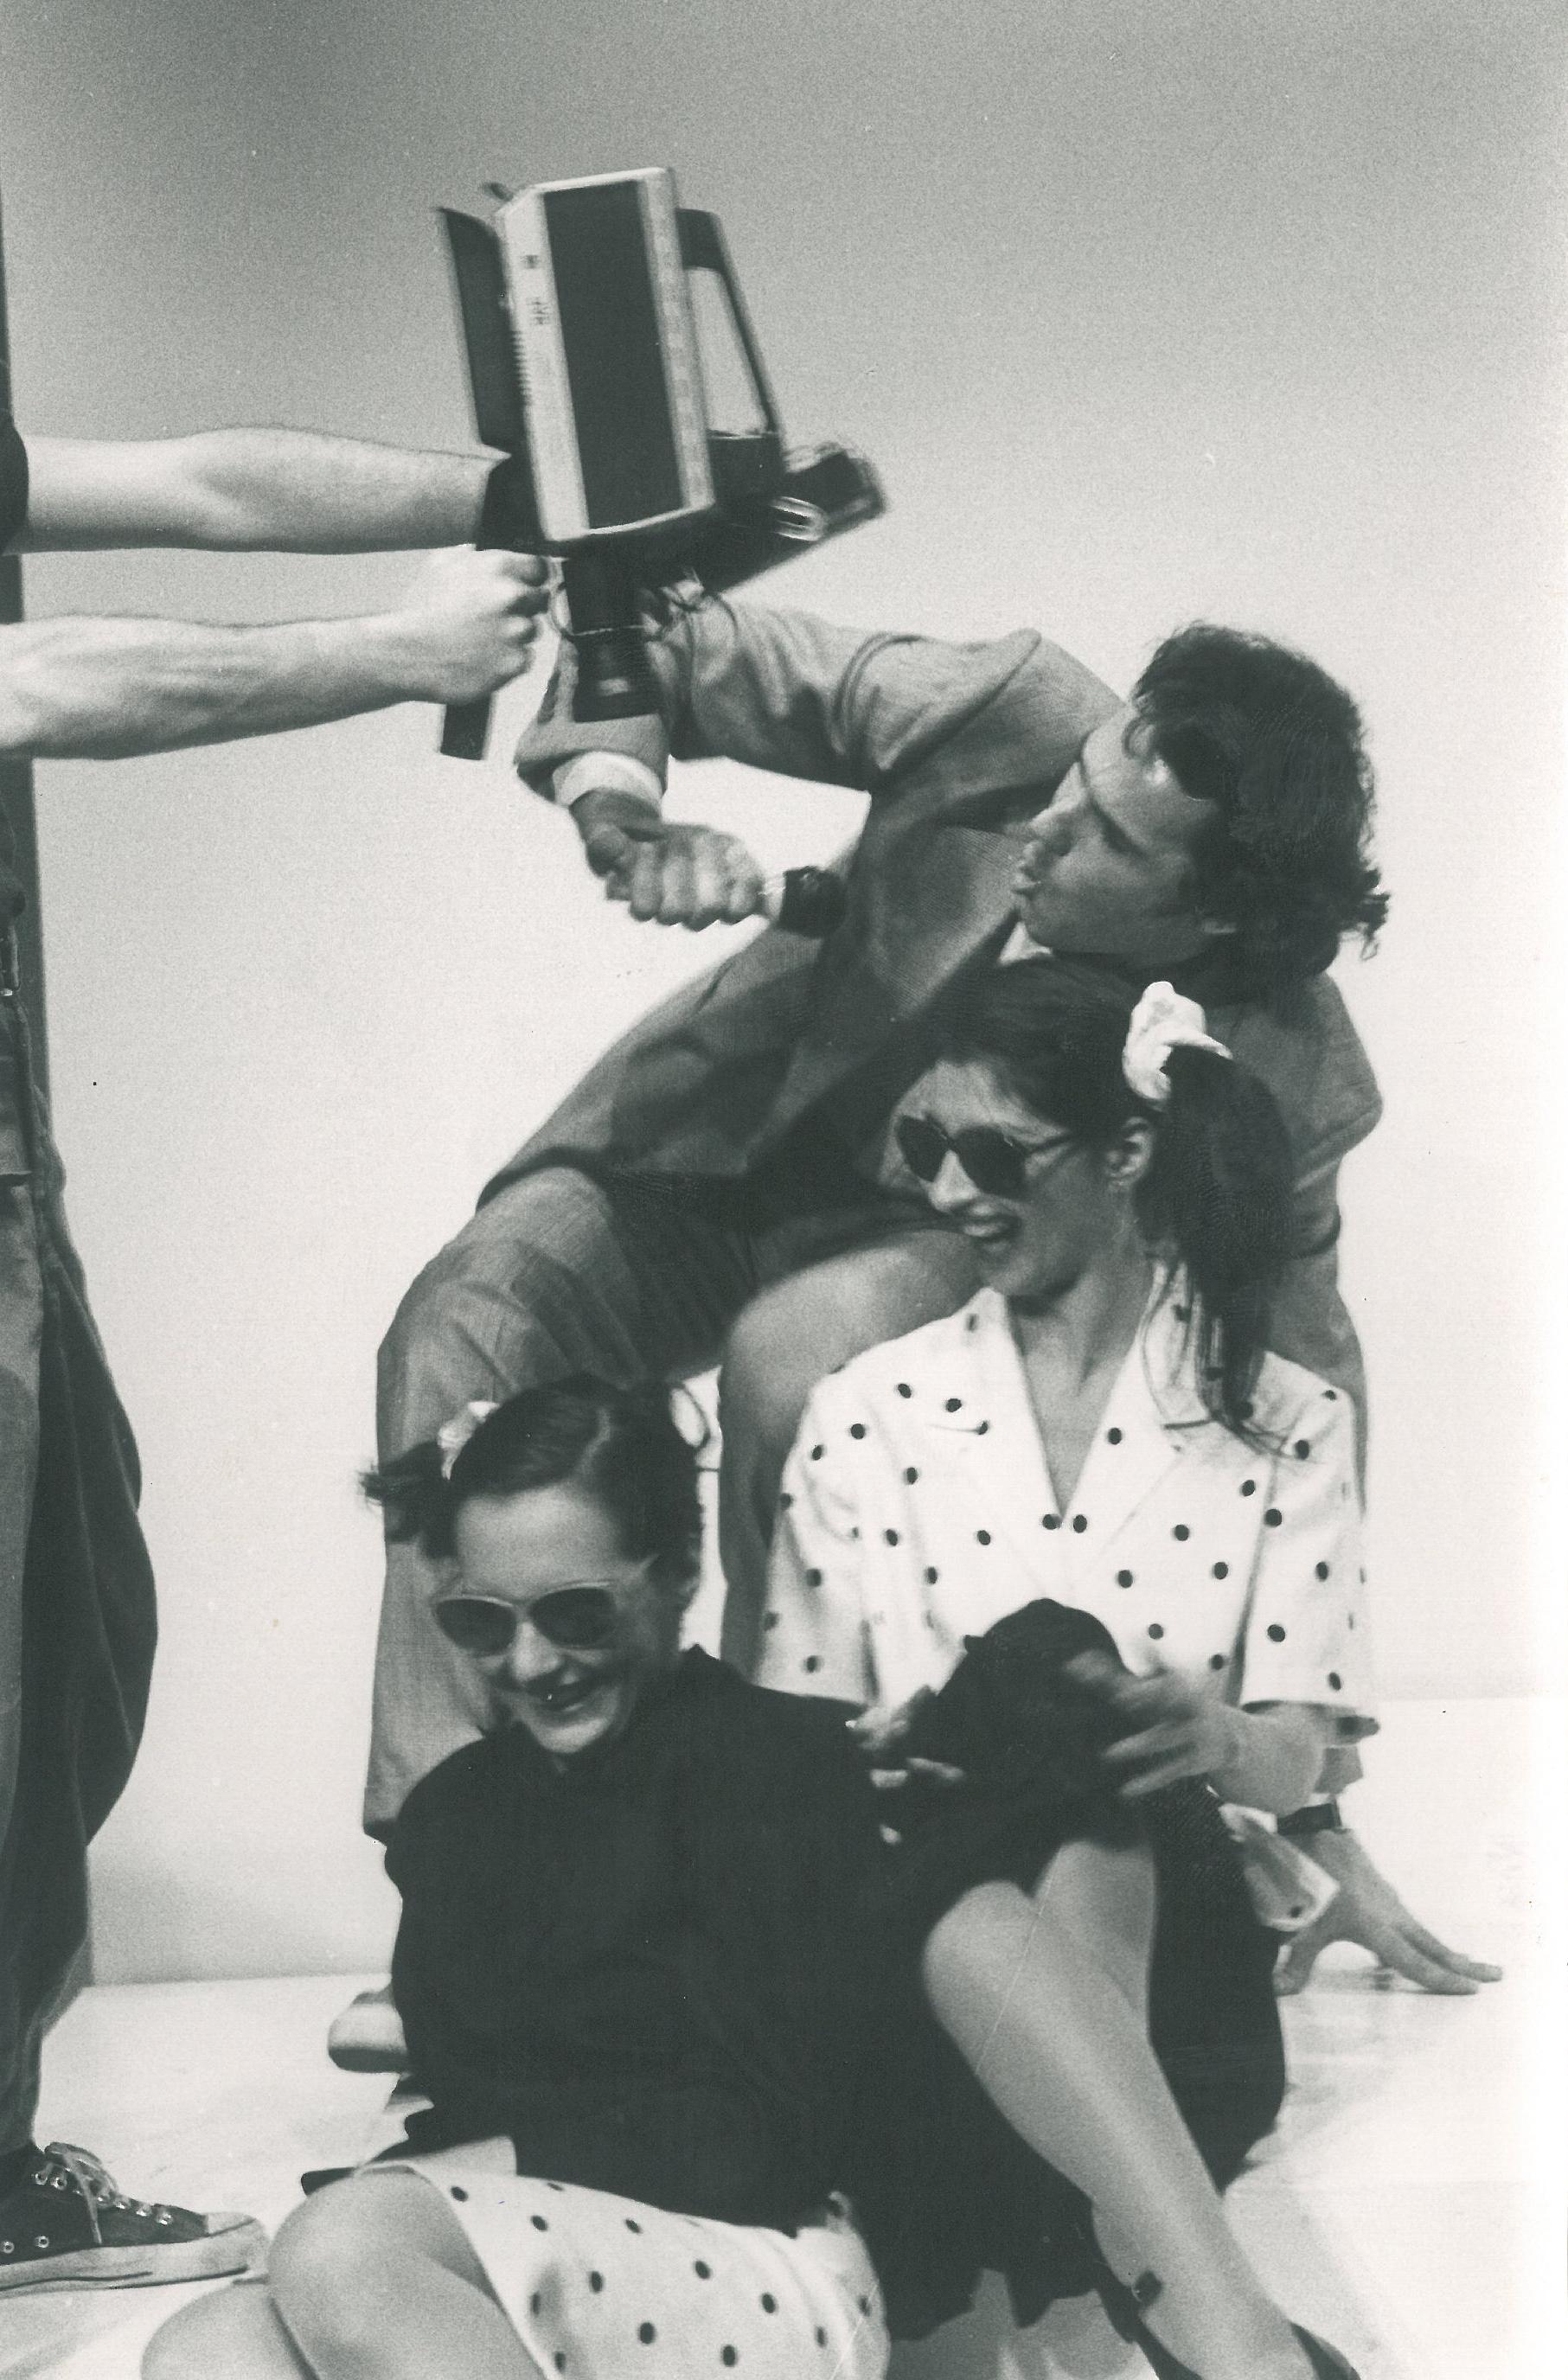 1988 in Kessy Canta . Regia di Claudio Caracolli, Compagnia Teatro Eliseo